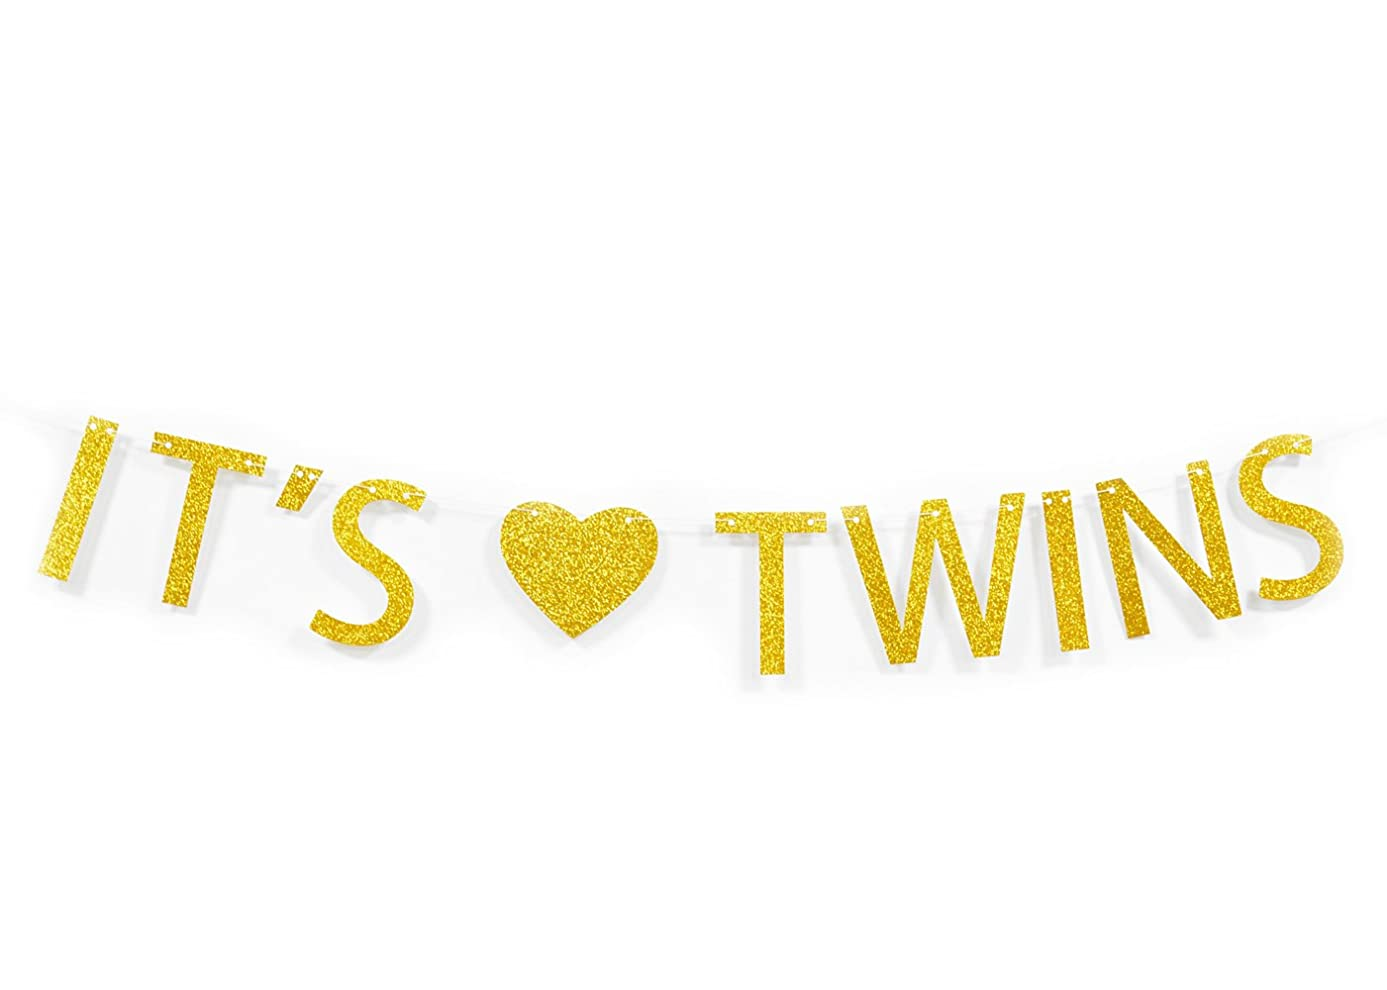 Qttier It's Twins Gold Glitter Banner Twins Baby Shower Gender Reveal Pregnancy Announcement Decor